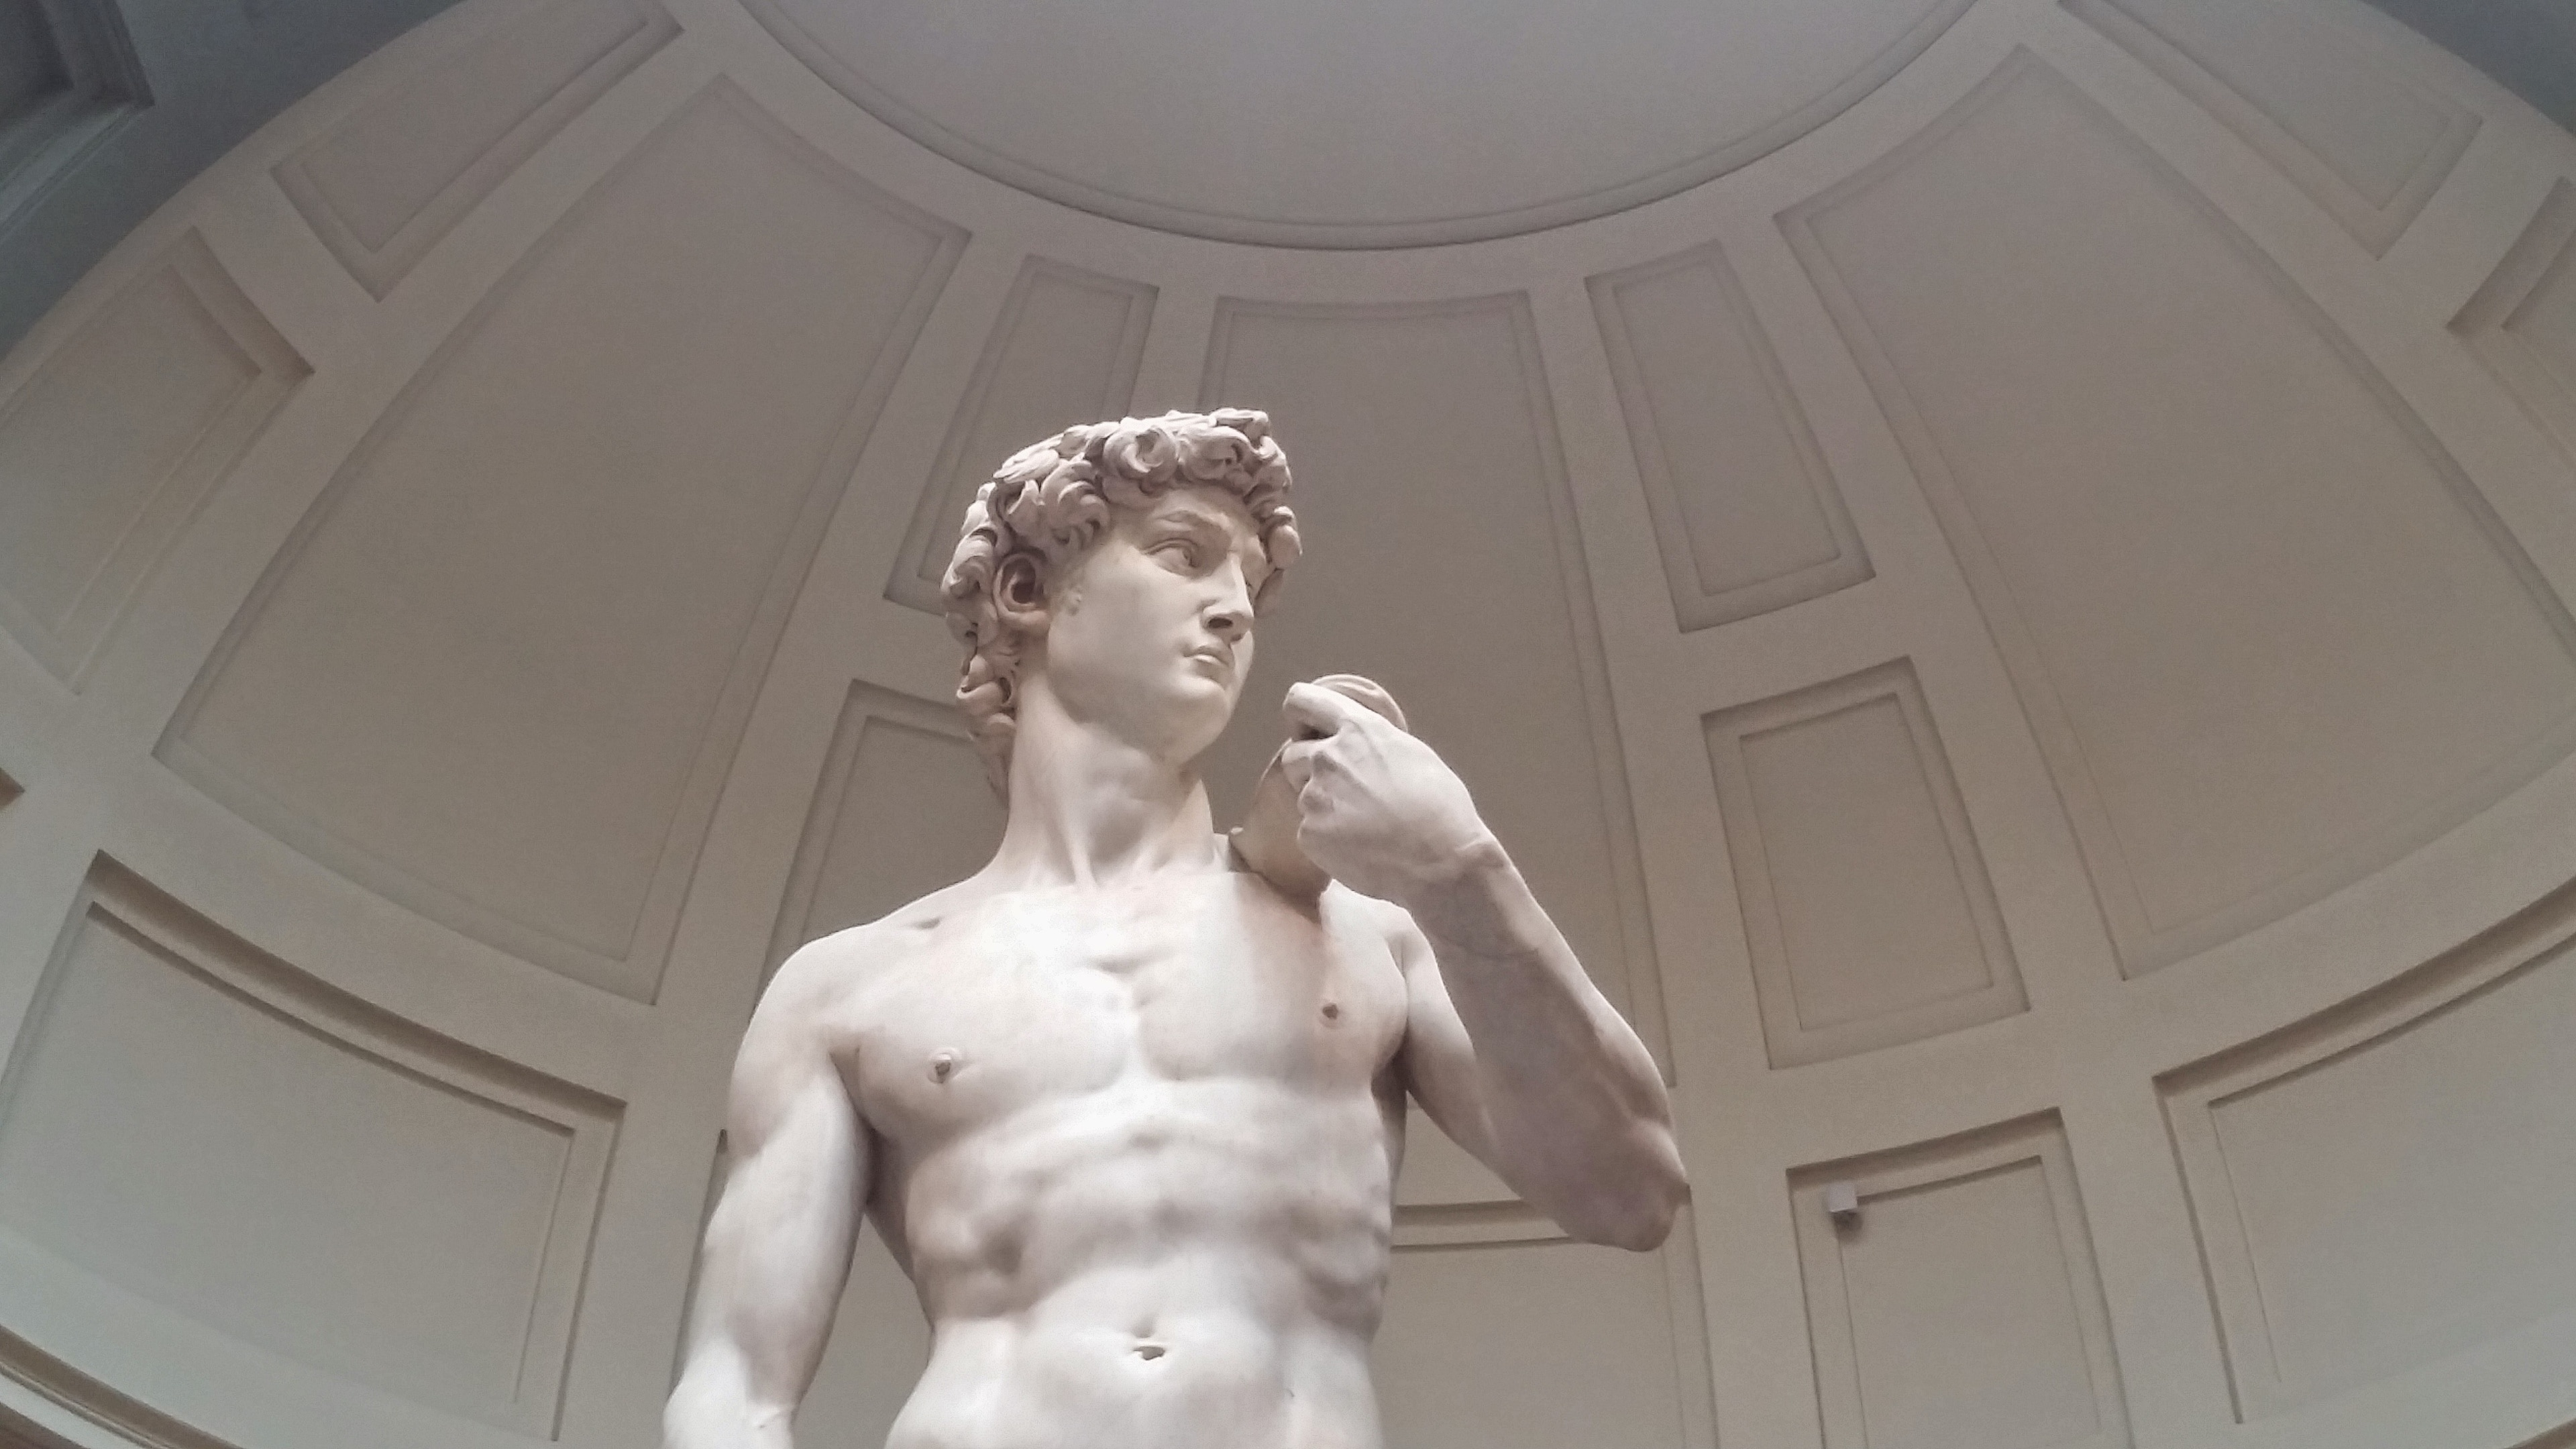 Academy of Fine Arts, Florence, Tuscany, Italy